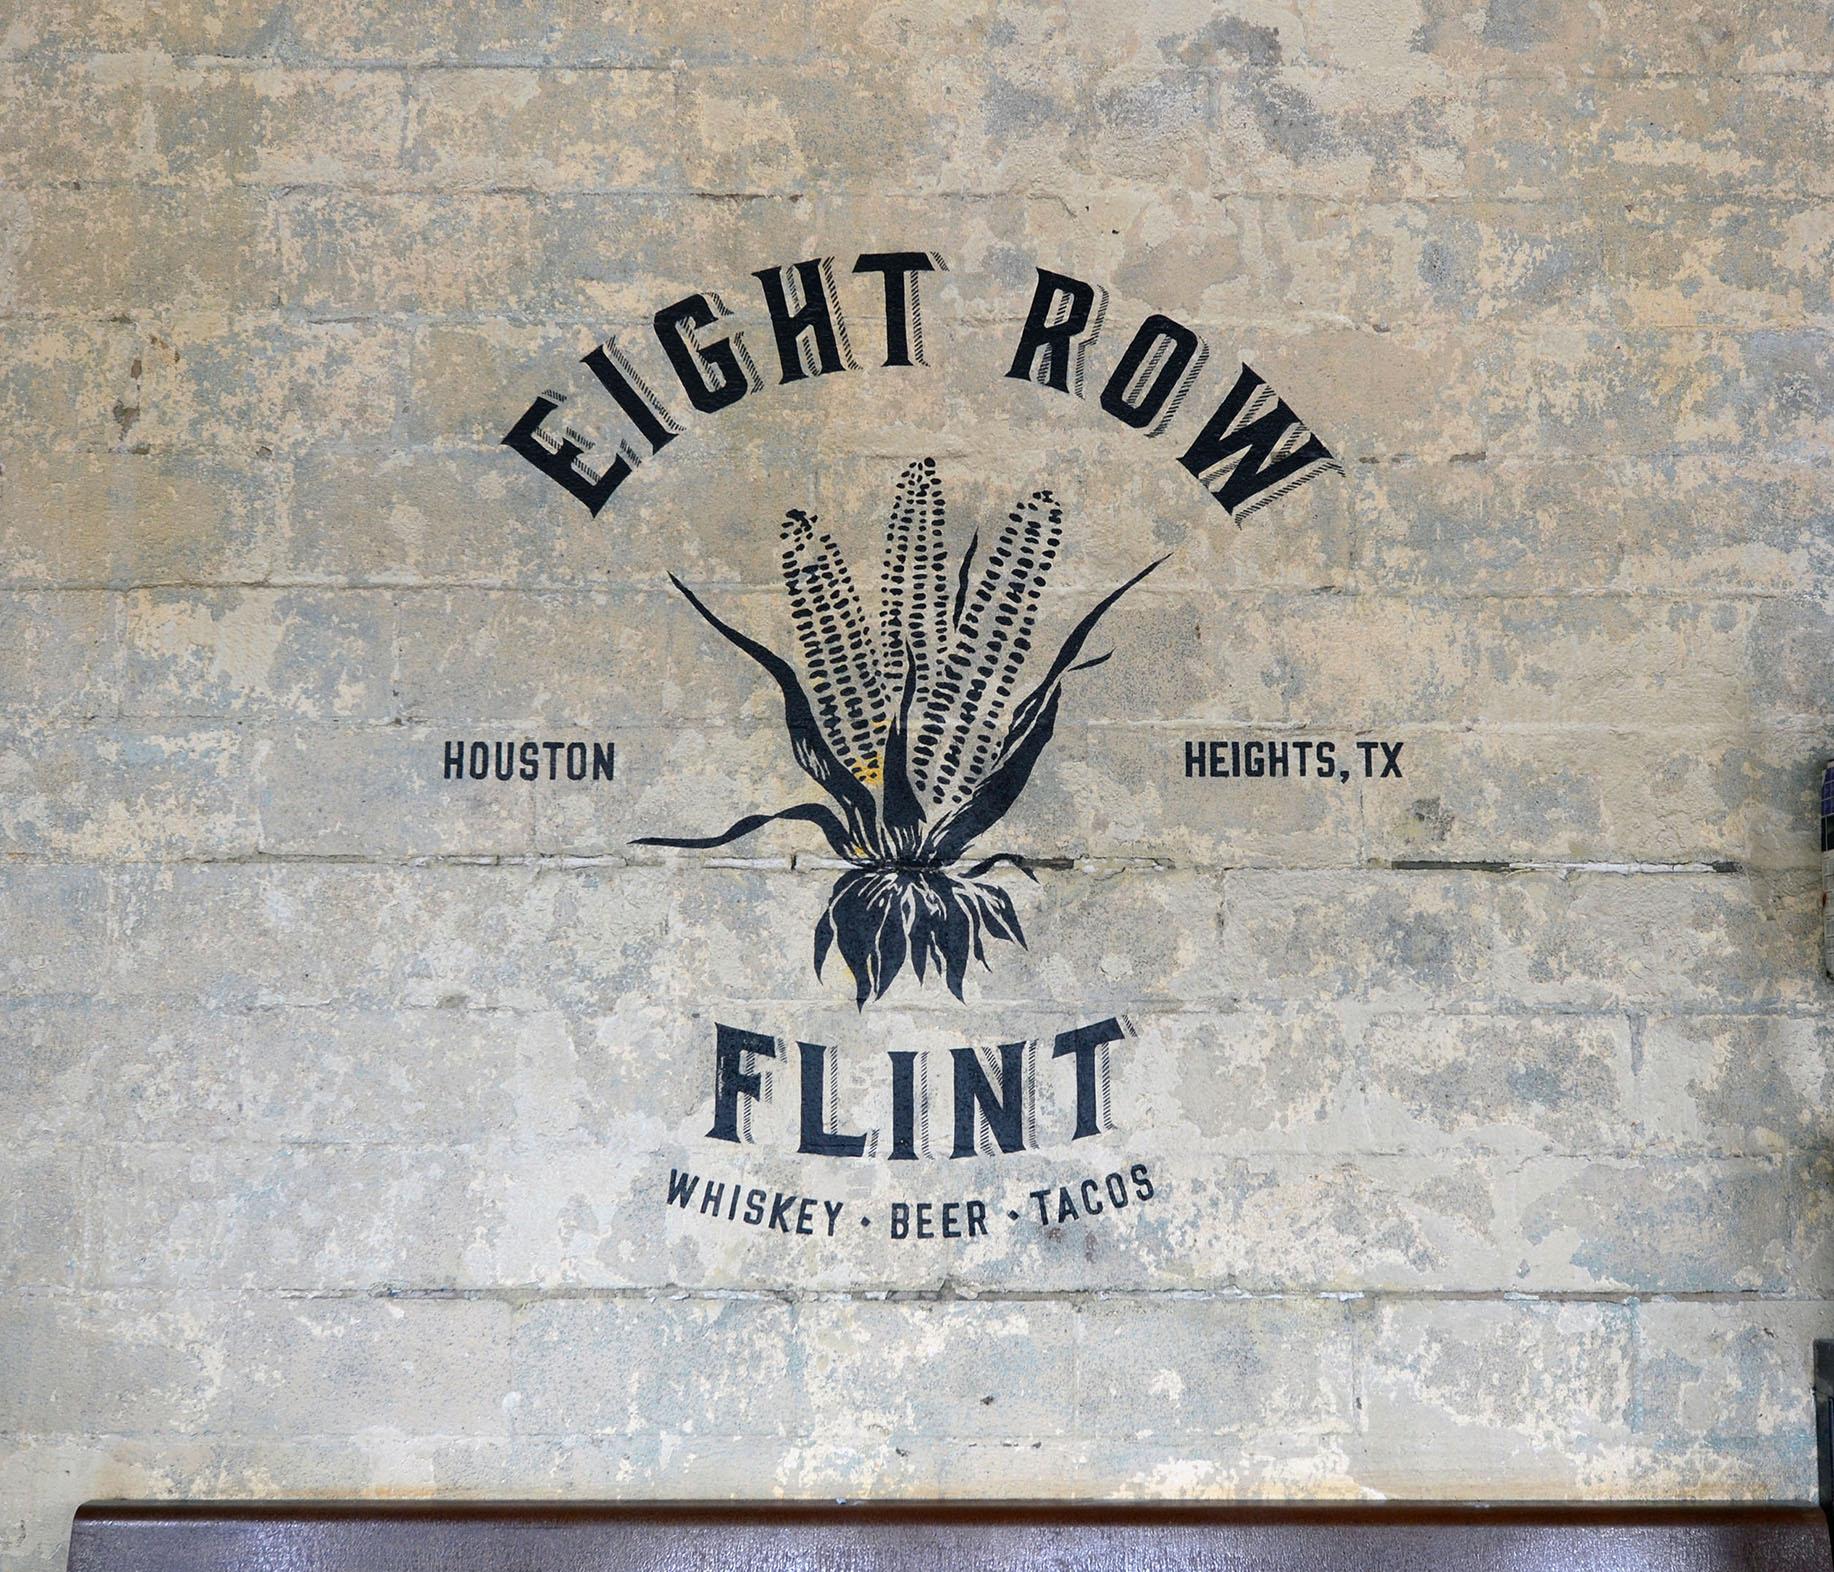 Eight row flint - branding